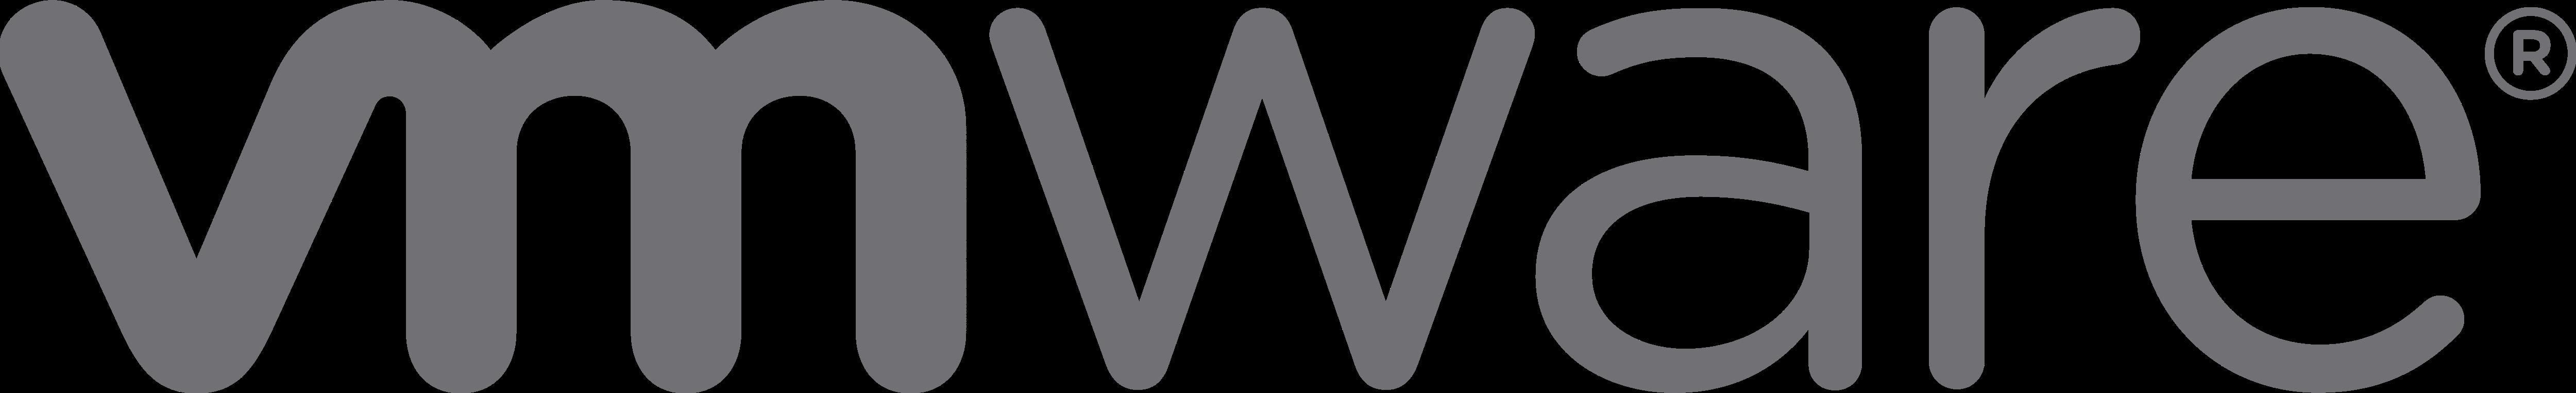 VMware - Logos Download